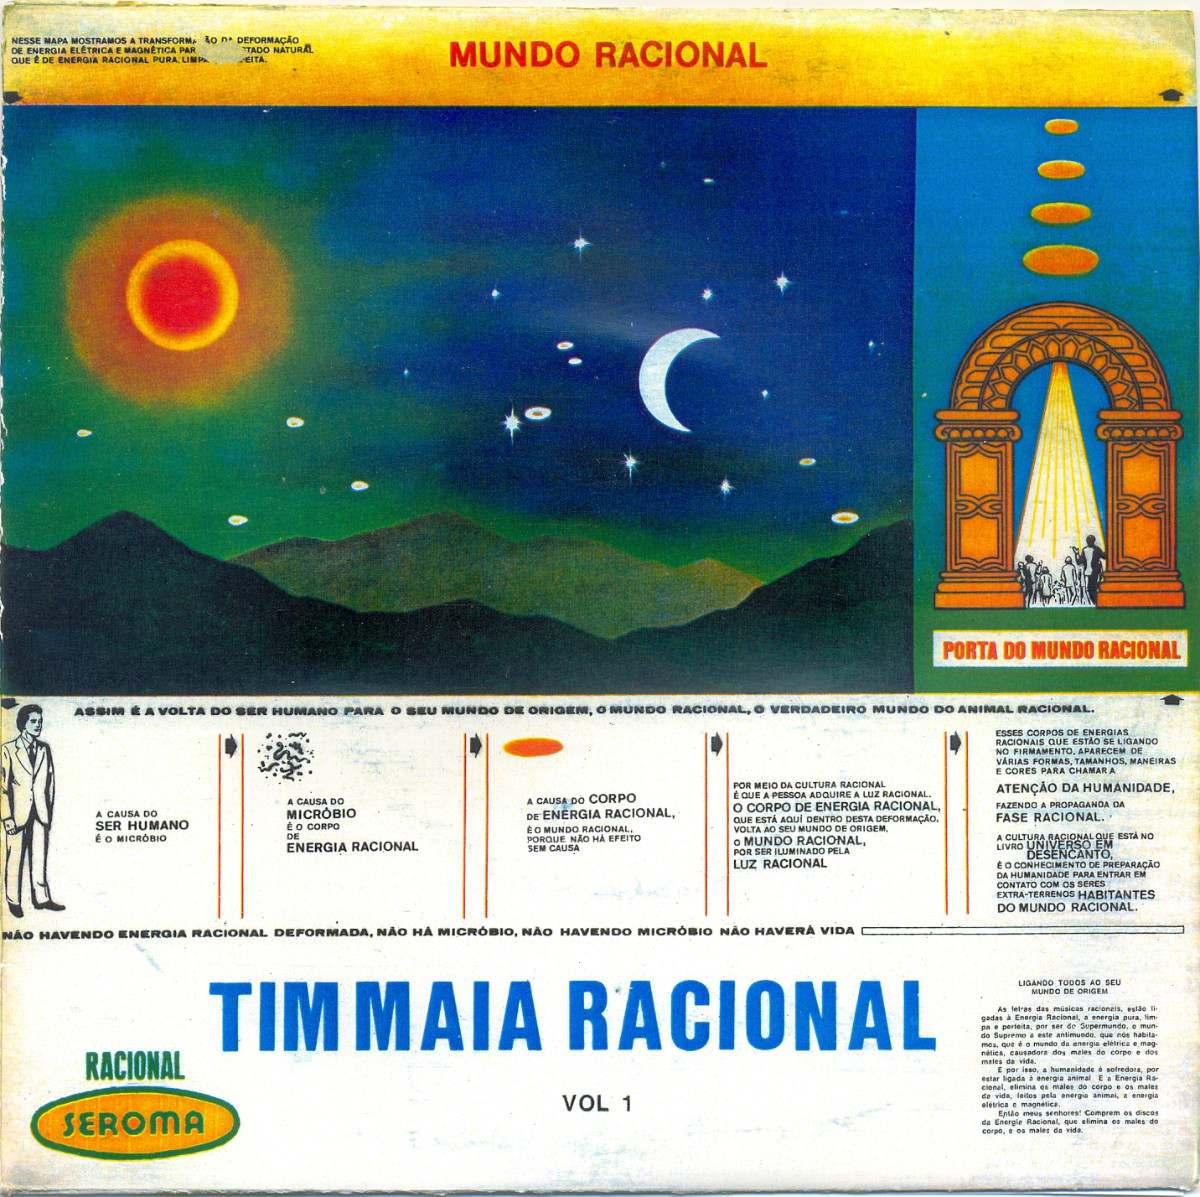 cp-tim-maia-racional-volume-1_MLB-F-3928333063_032013